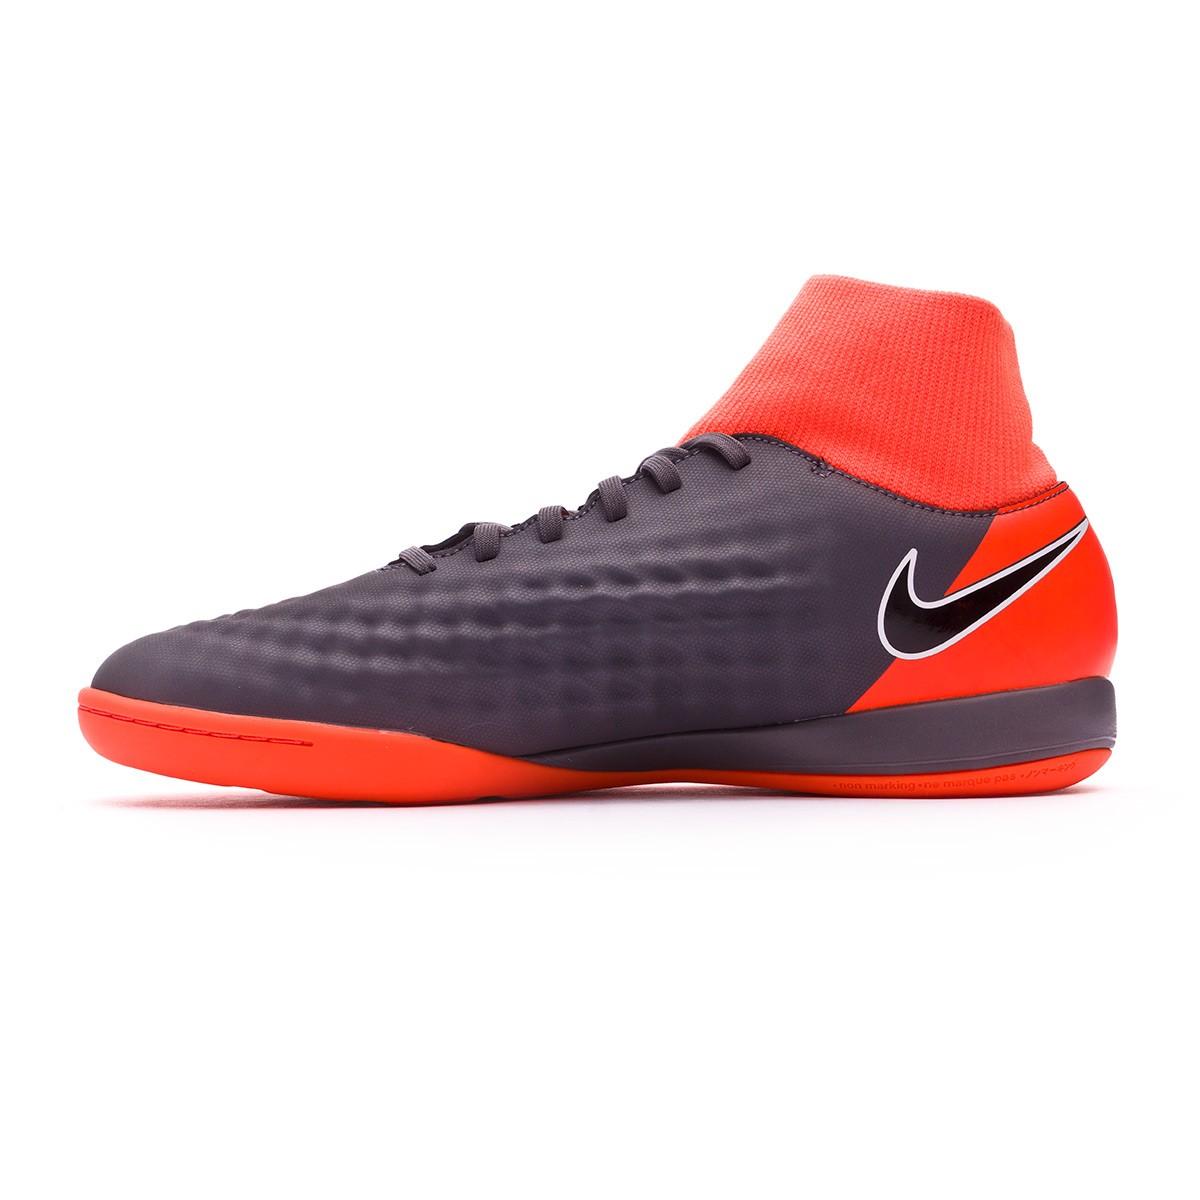 nike magista futsal shoes